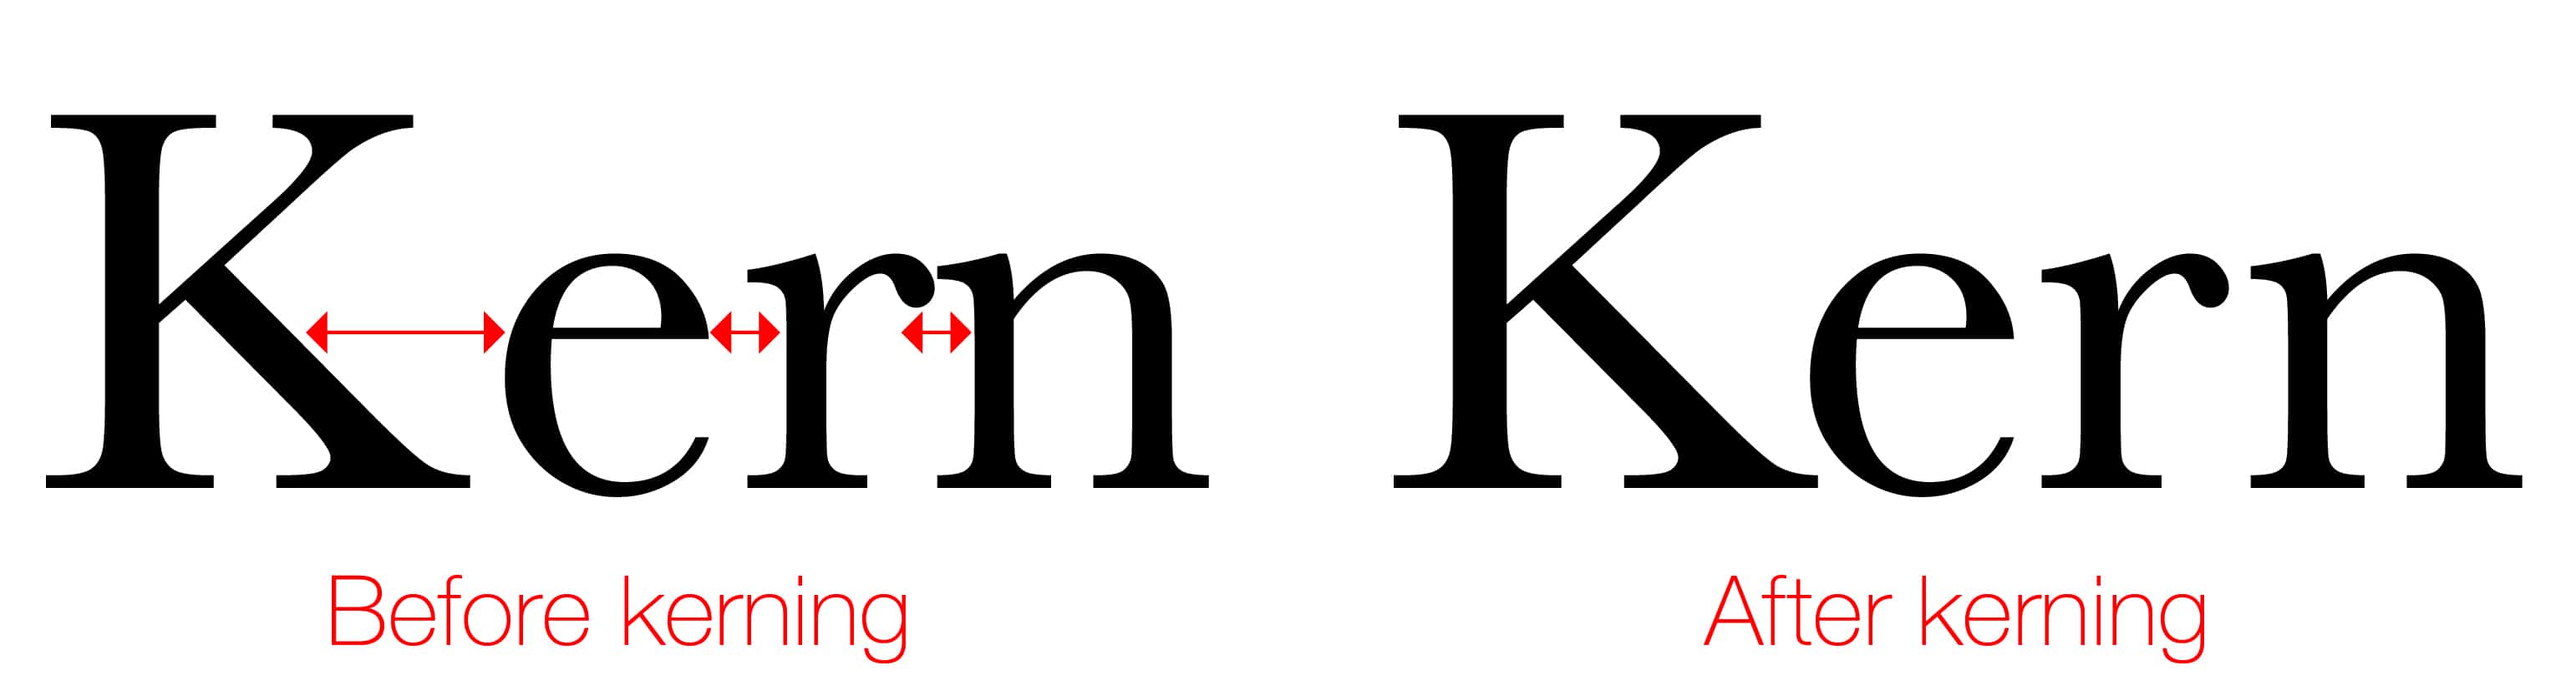 Kerning graphic